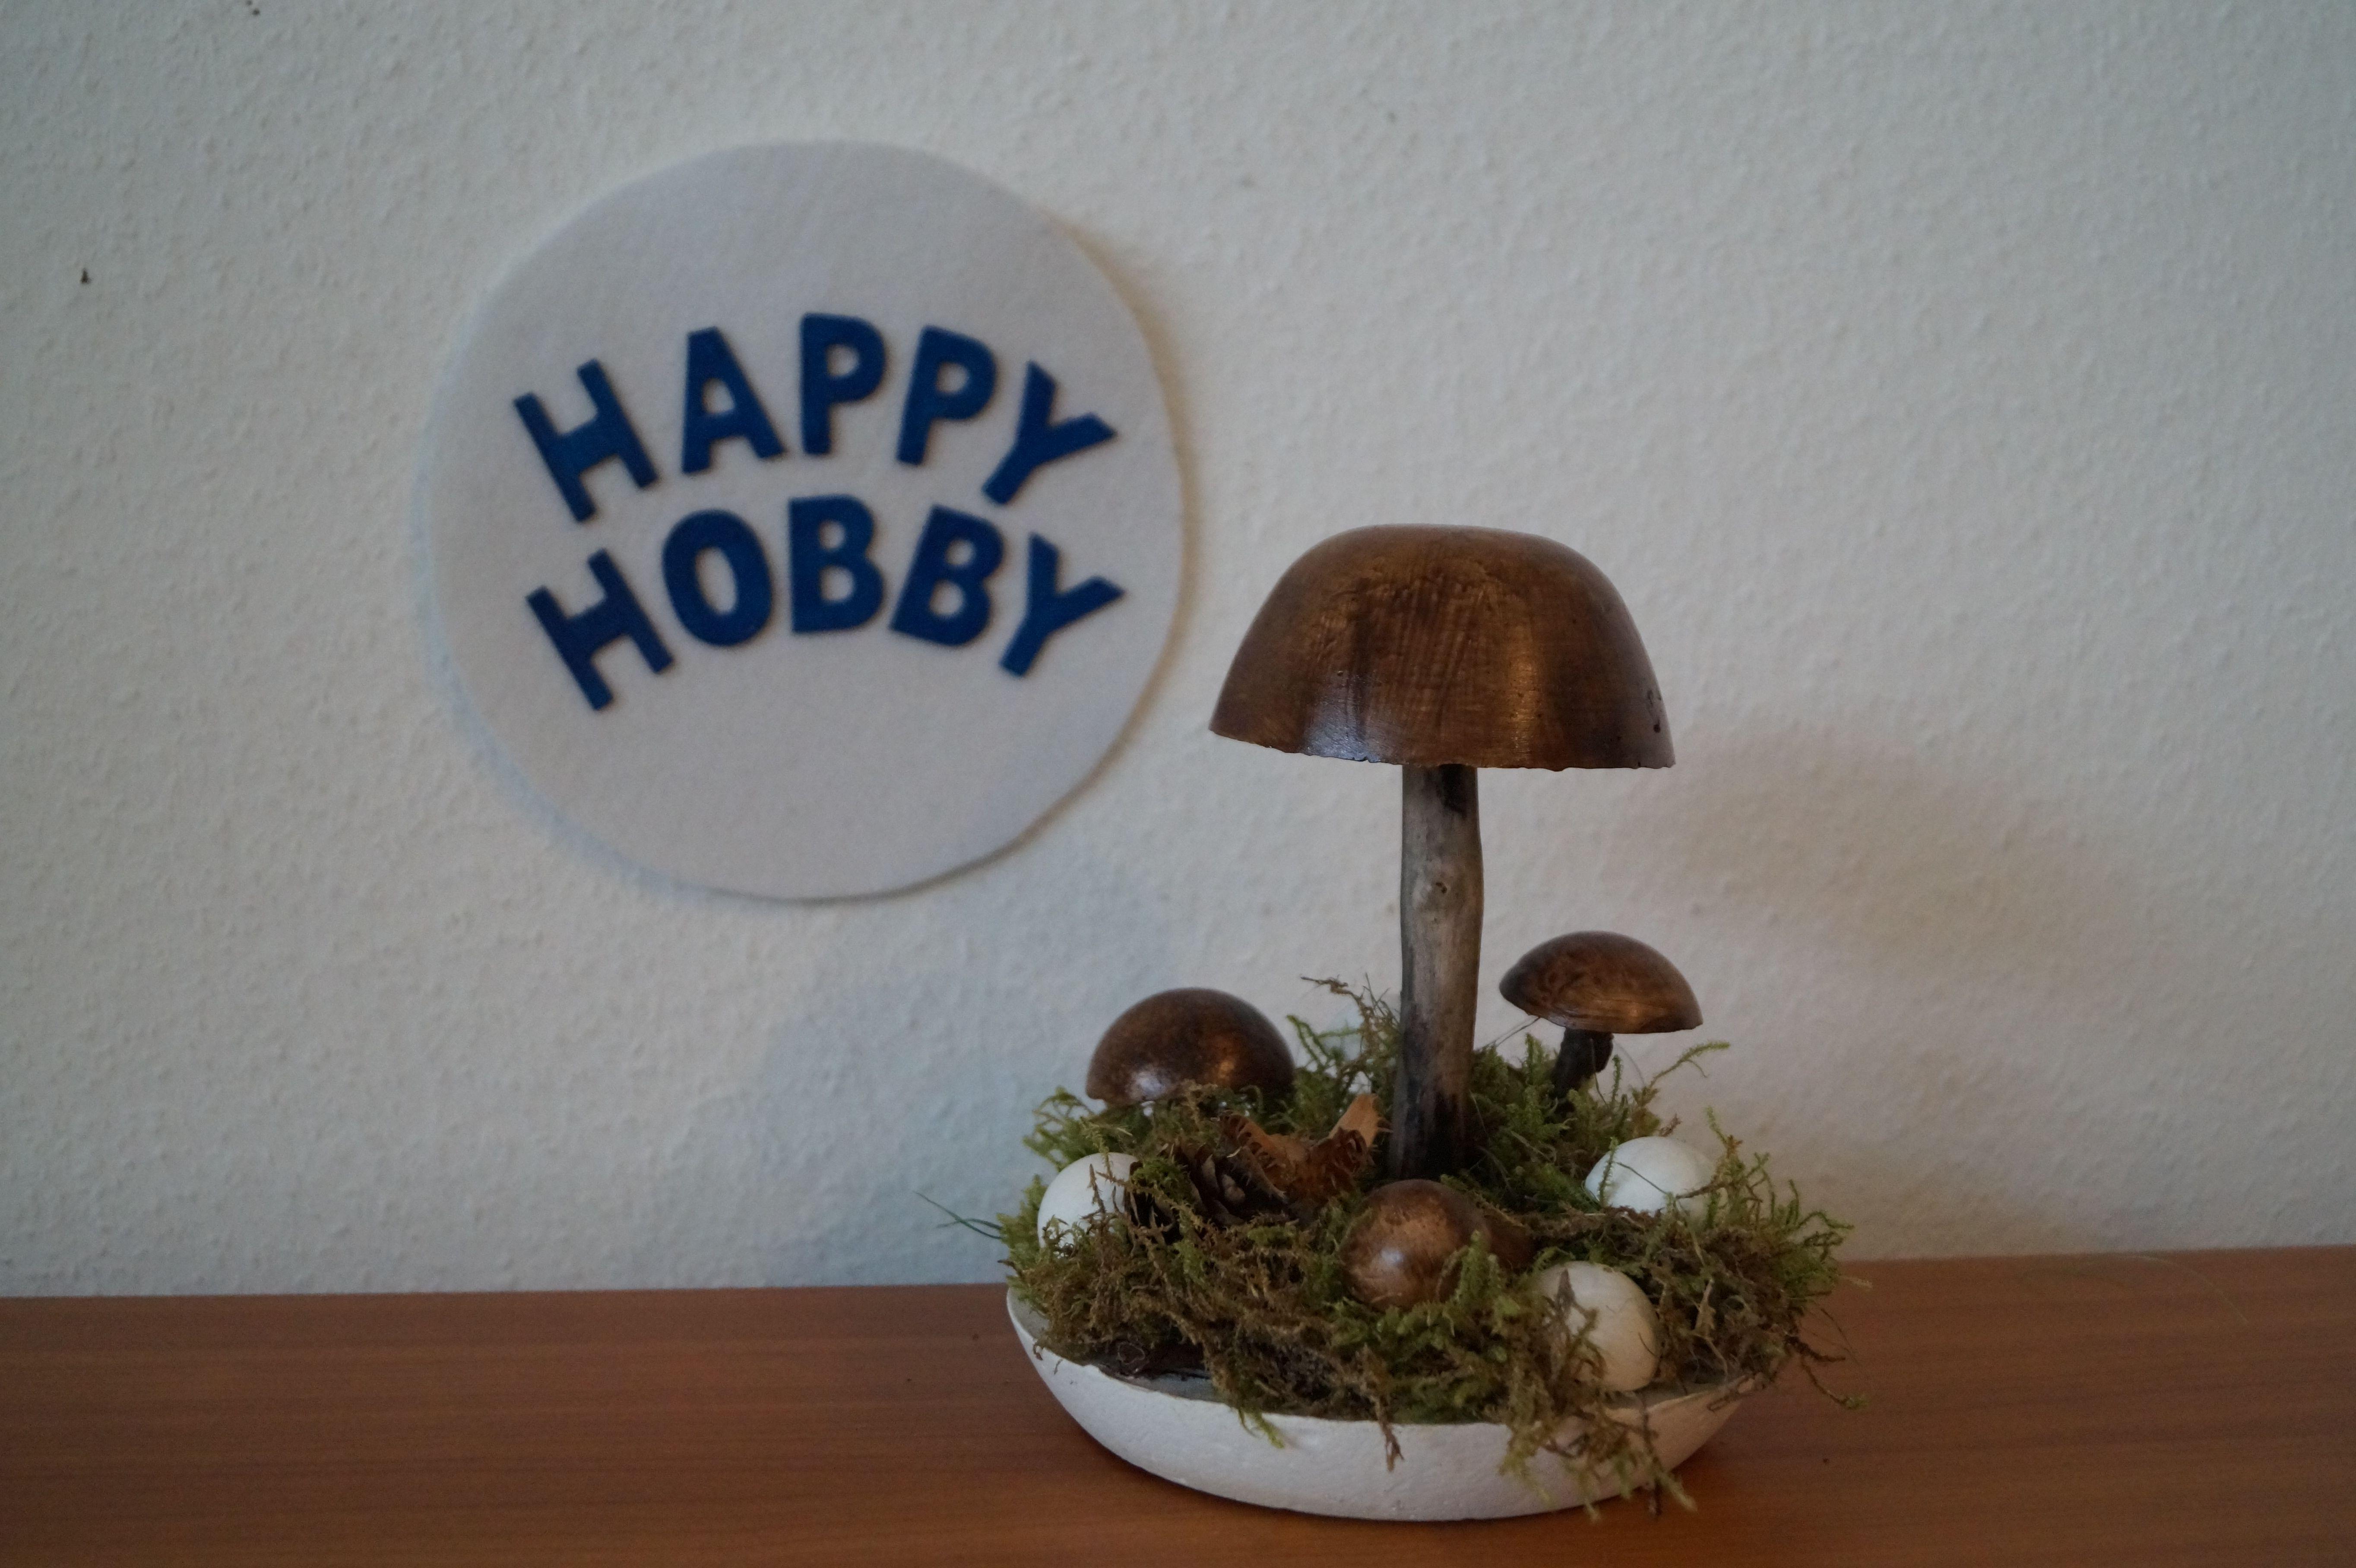 3D Pilze aus Gips und Ast, Herbst, Deko, DIY Youtube | DIY Basteln ...